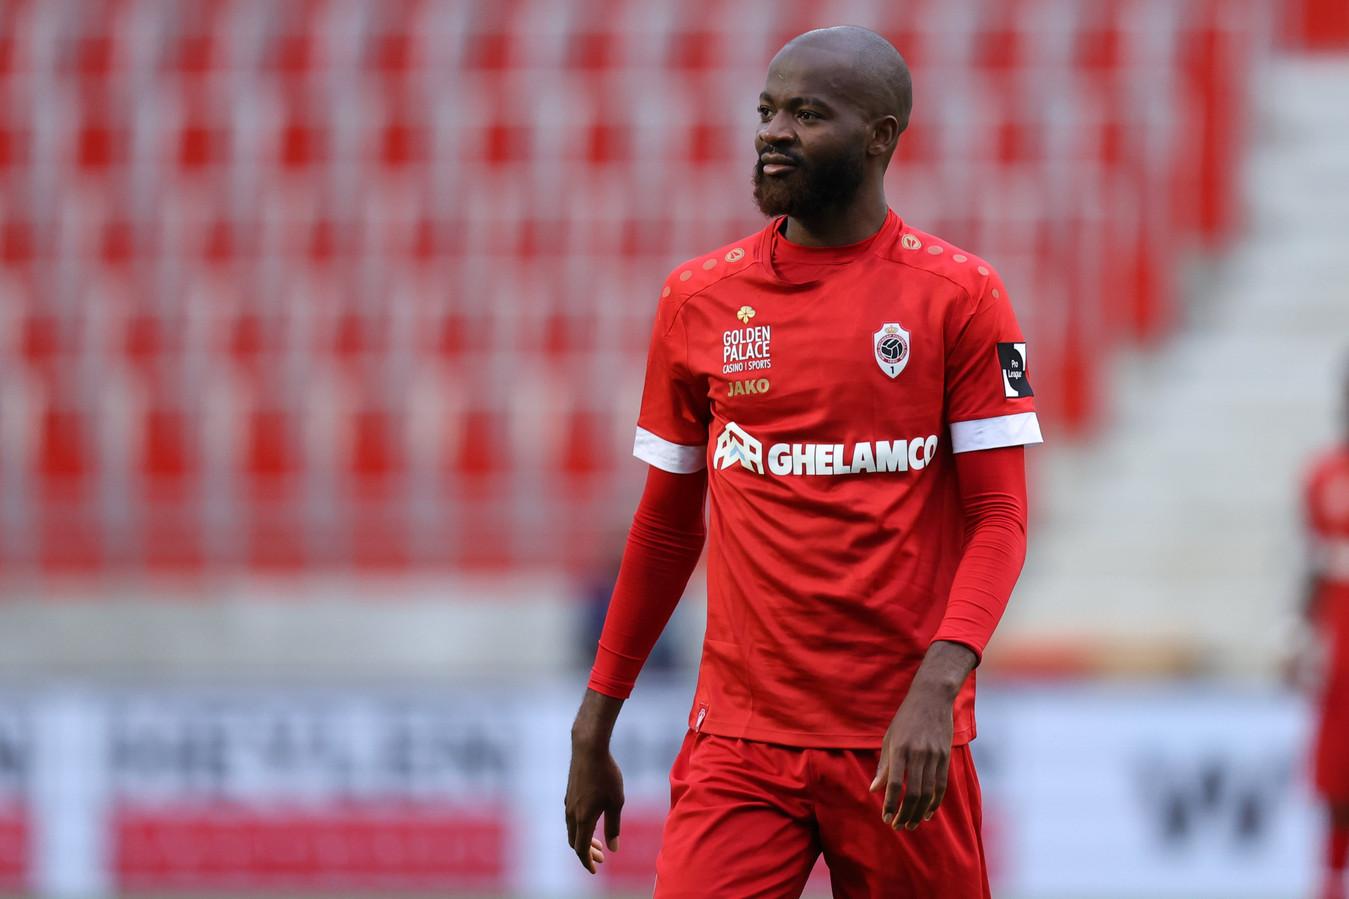 Didier Lamkel Zé